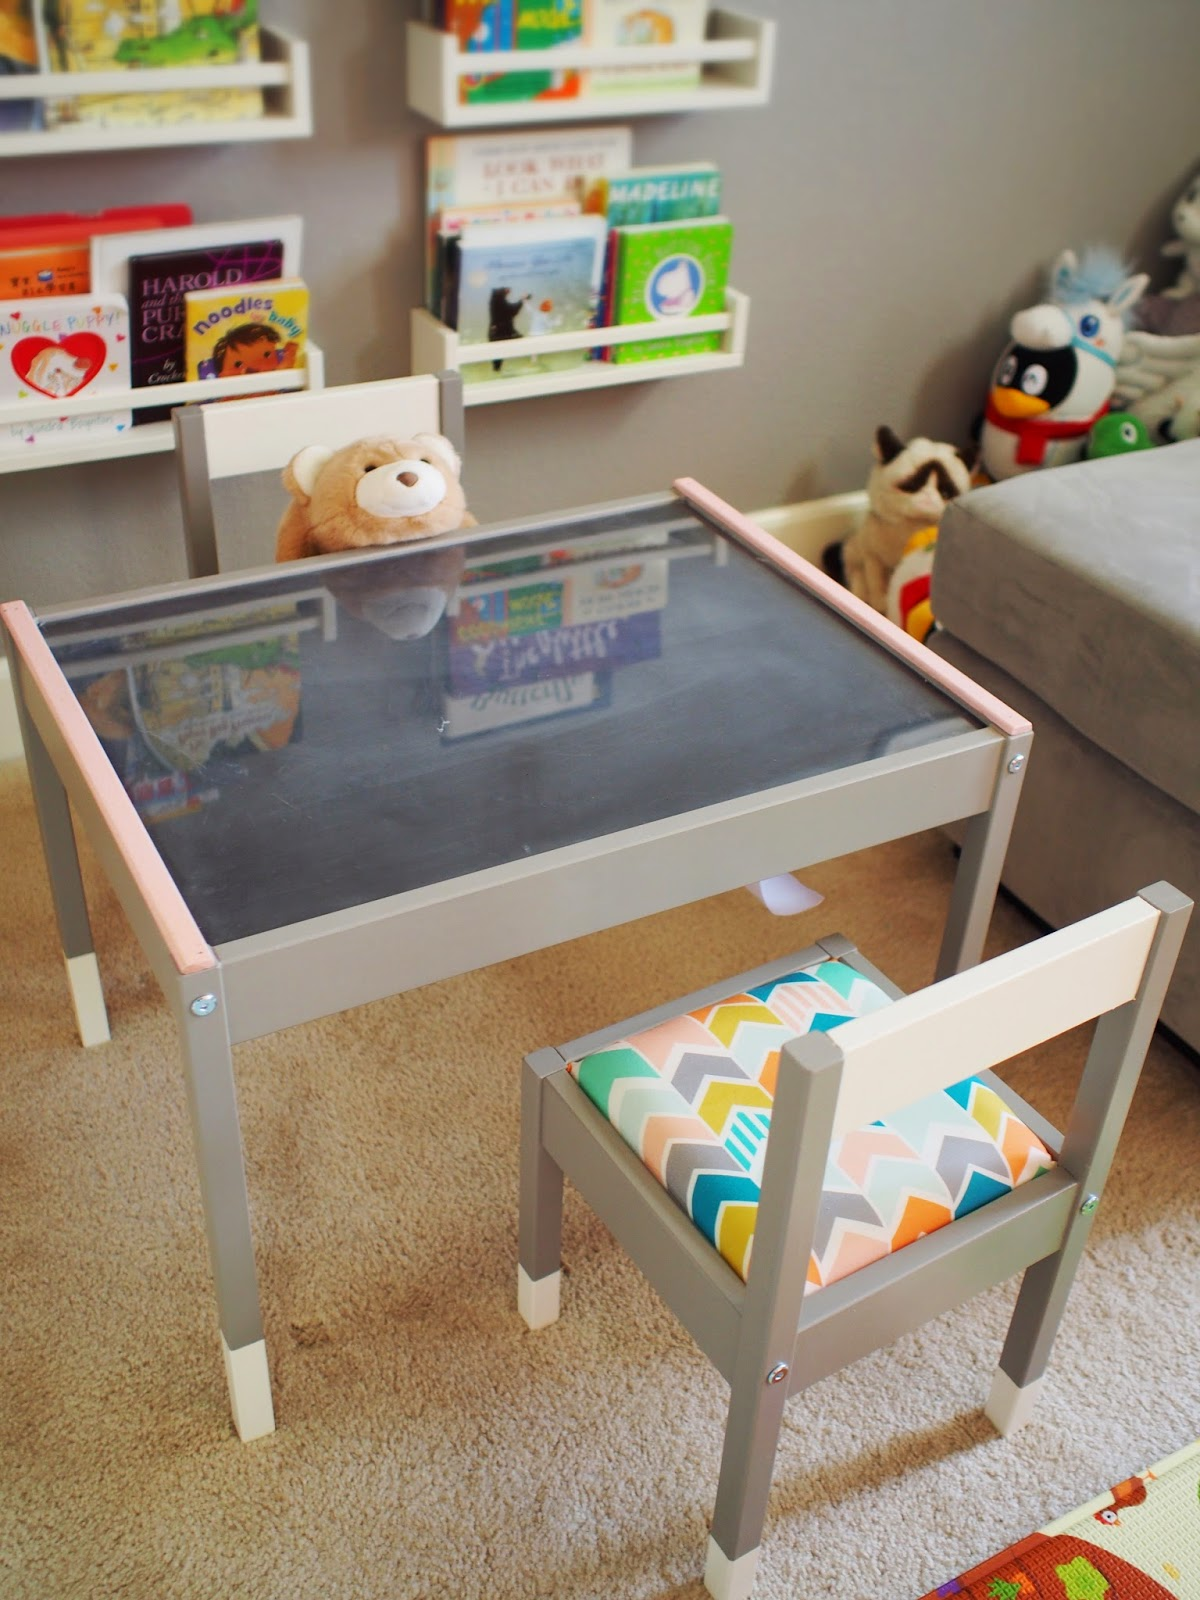 Children S Playroom Sofa 2 Seat Reclining Leather Chibitofu A 39s New Play Table An Ikea Latt Hack